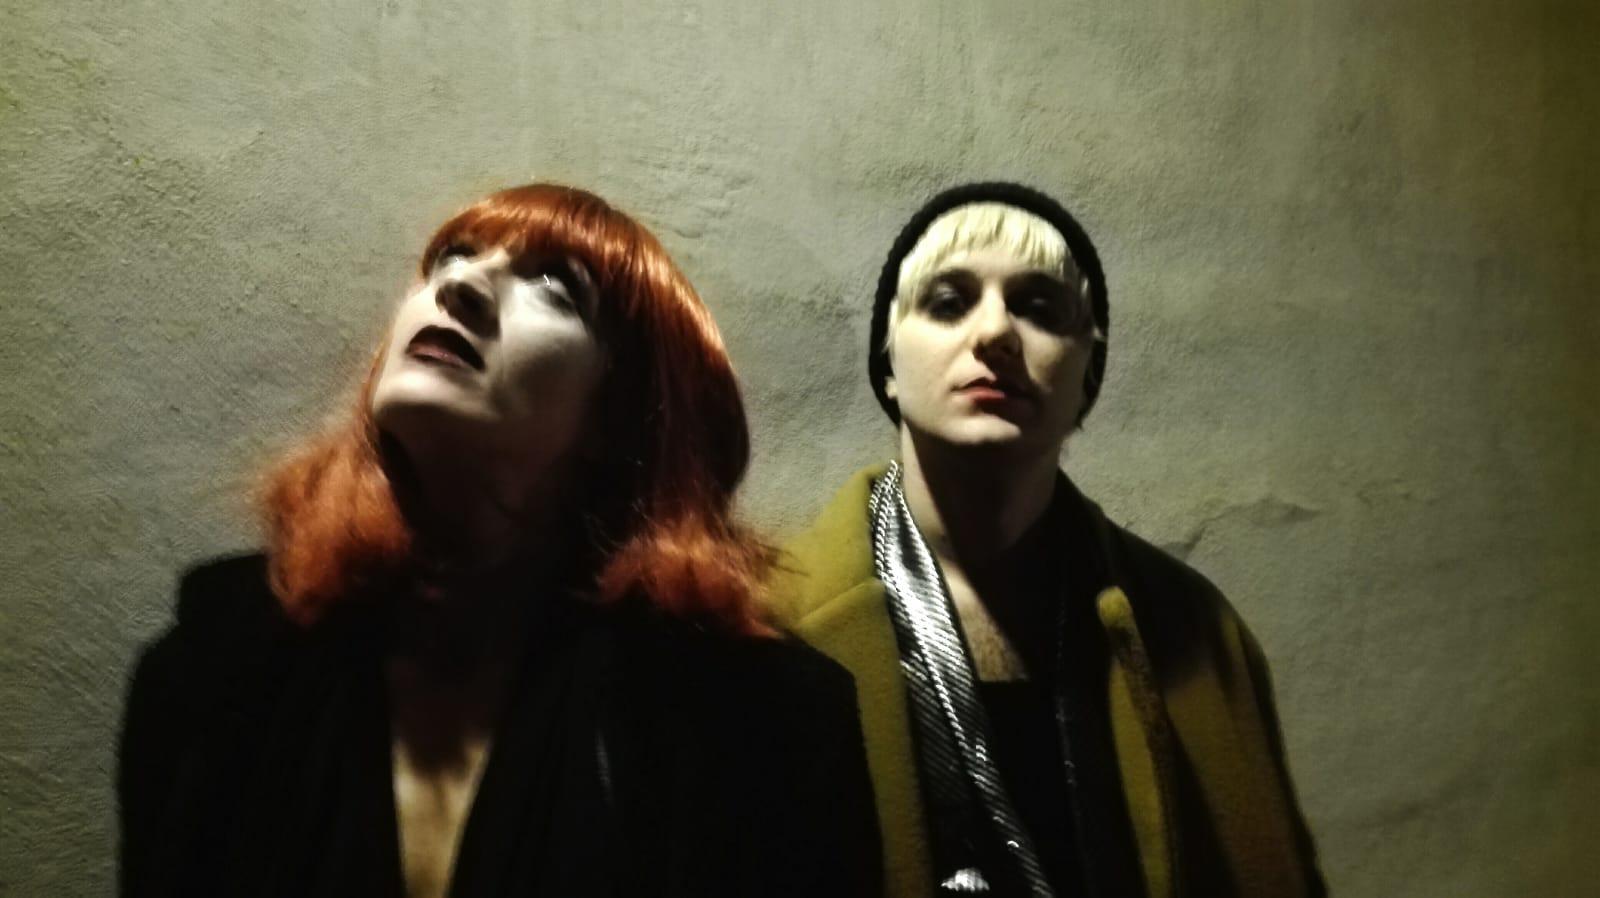 Orestiadi - Elle Life show